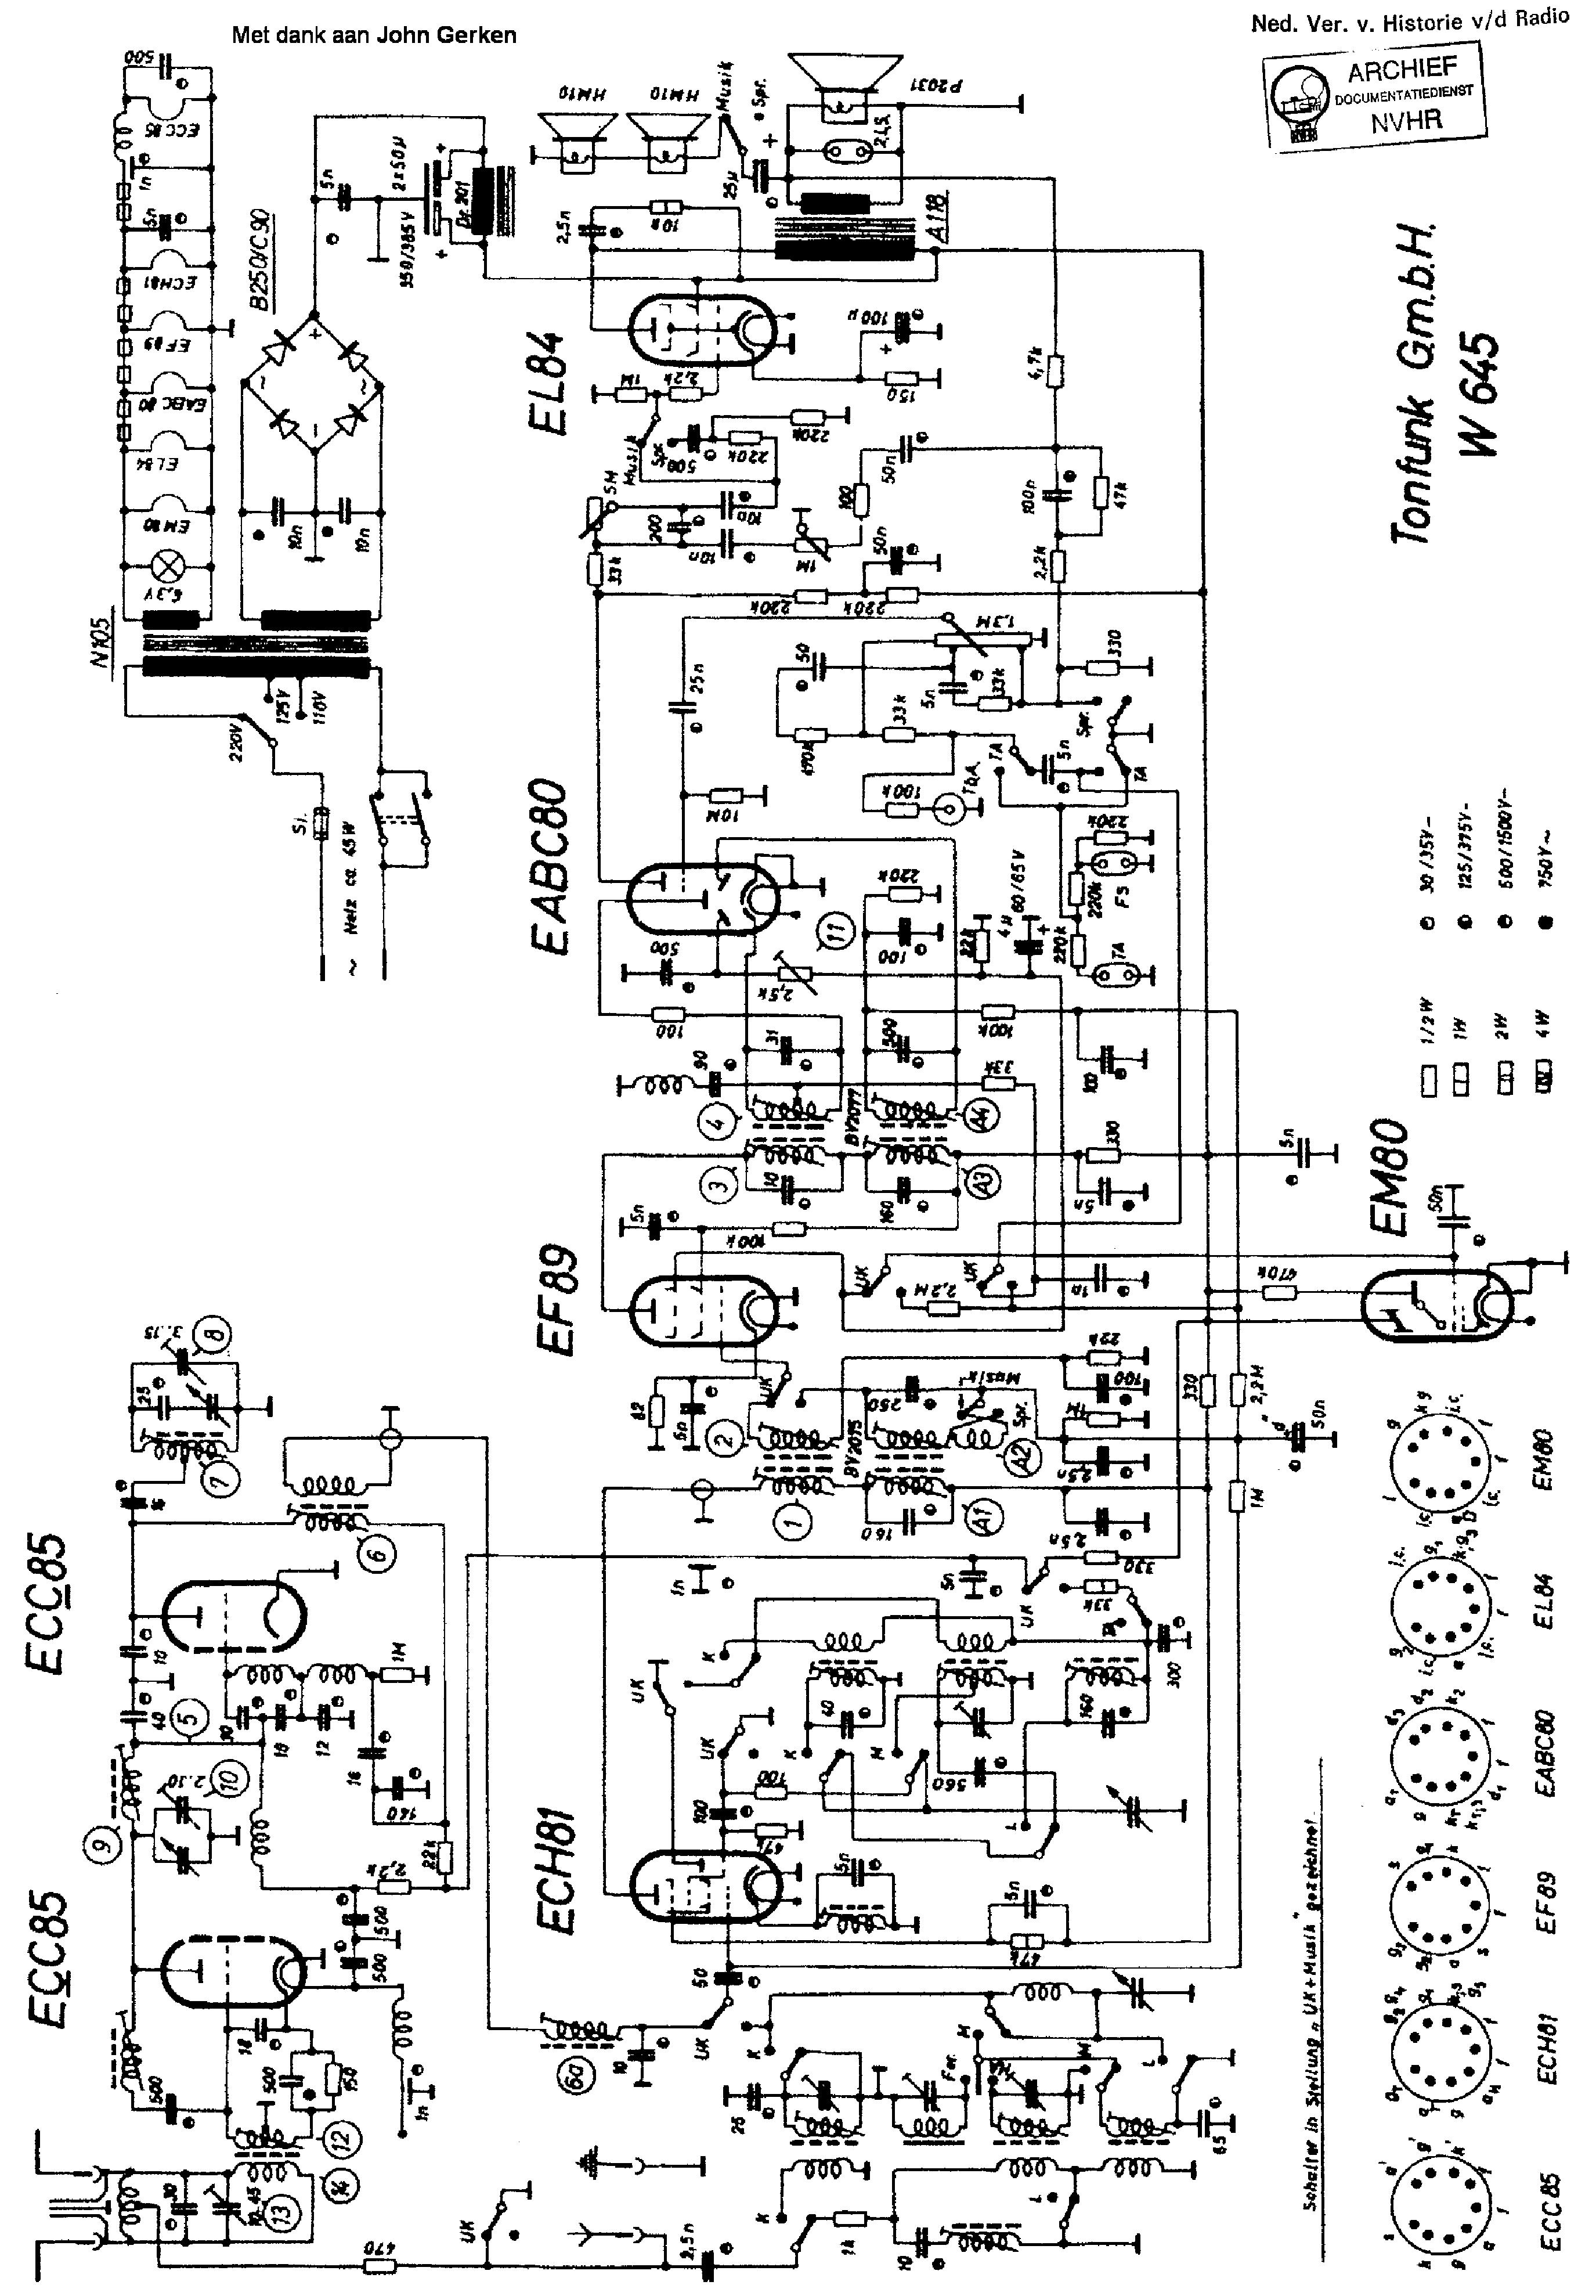 Tonfunk Violetta Ukw V D Am Fm Receiver Sch Service Manual Download F M Circuit Diagram Free